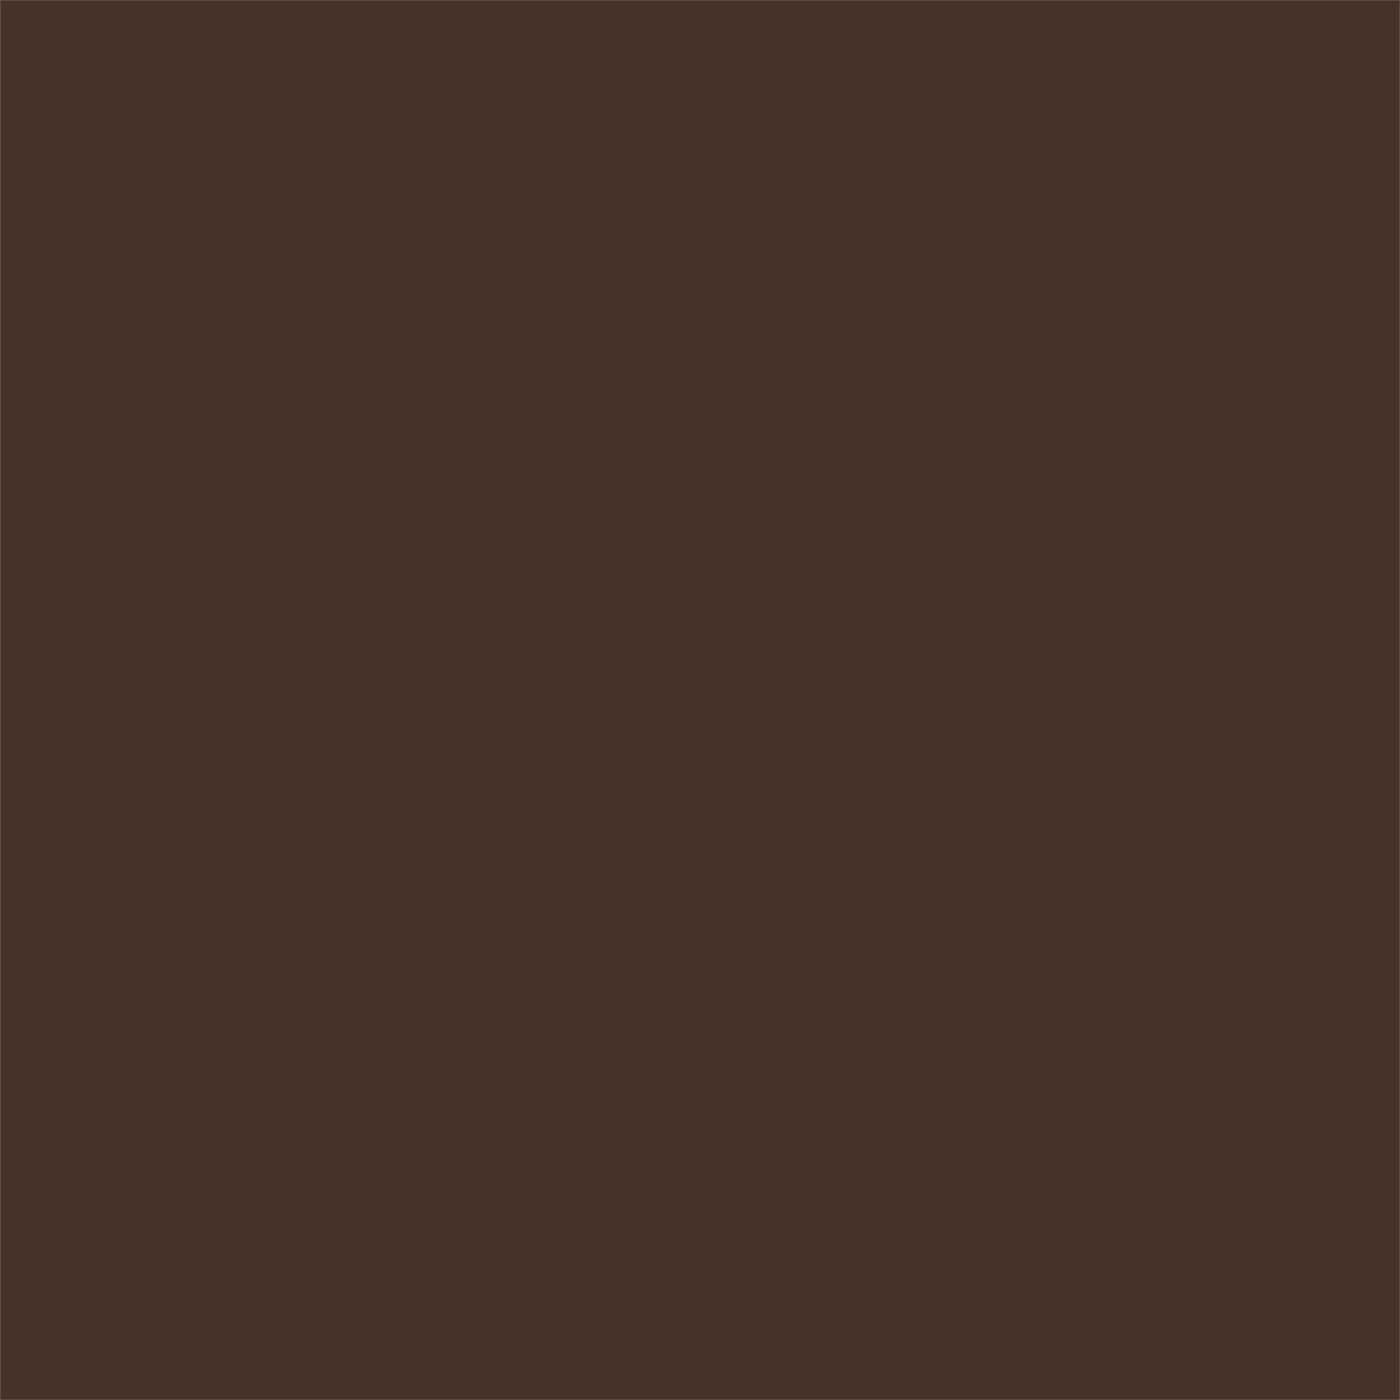 Java #Cocoa